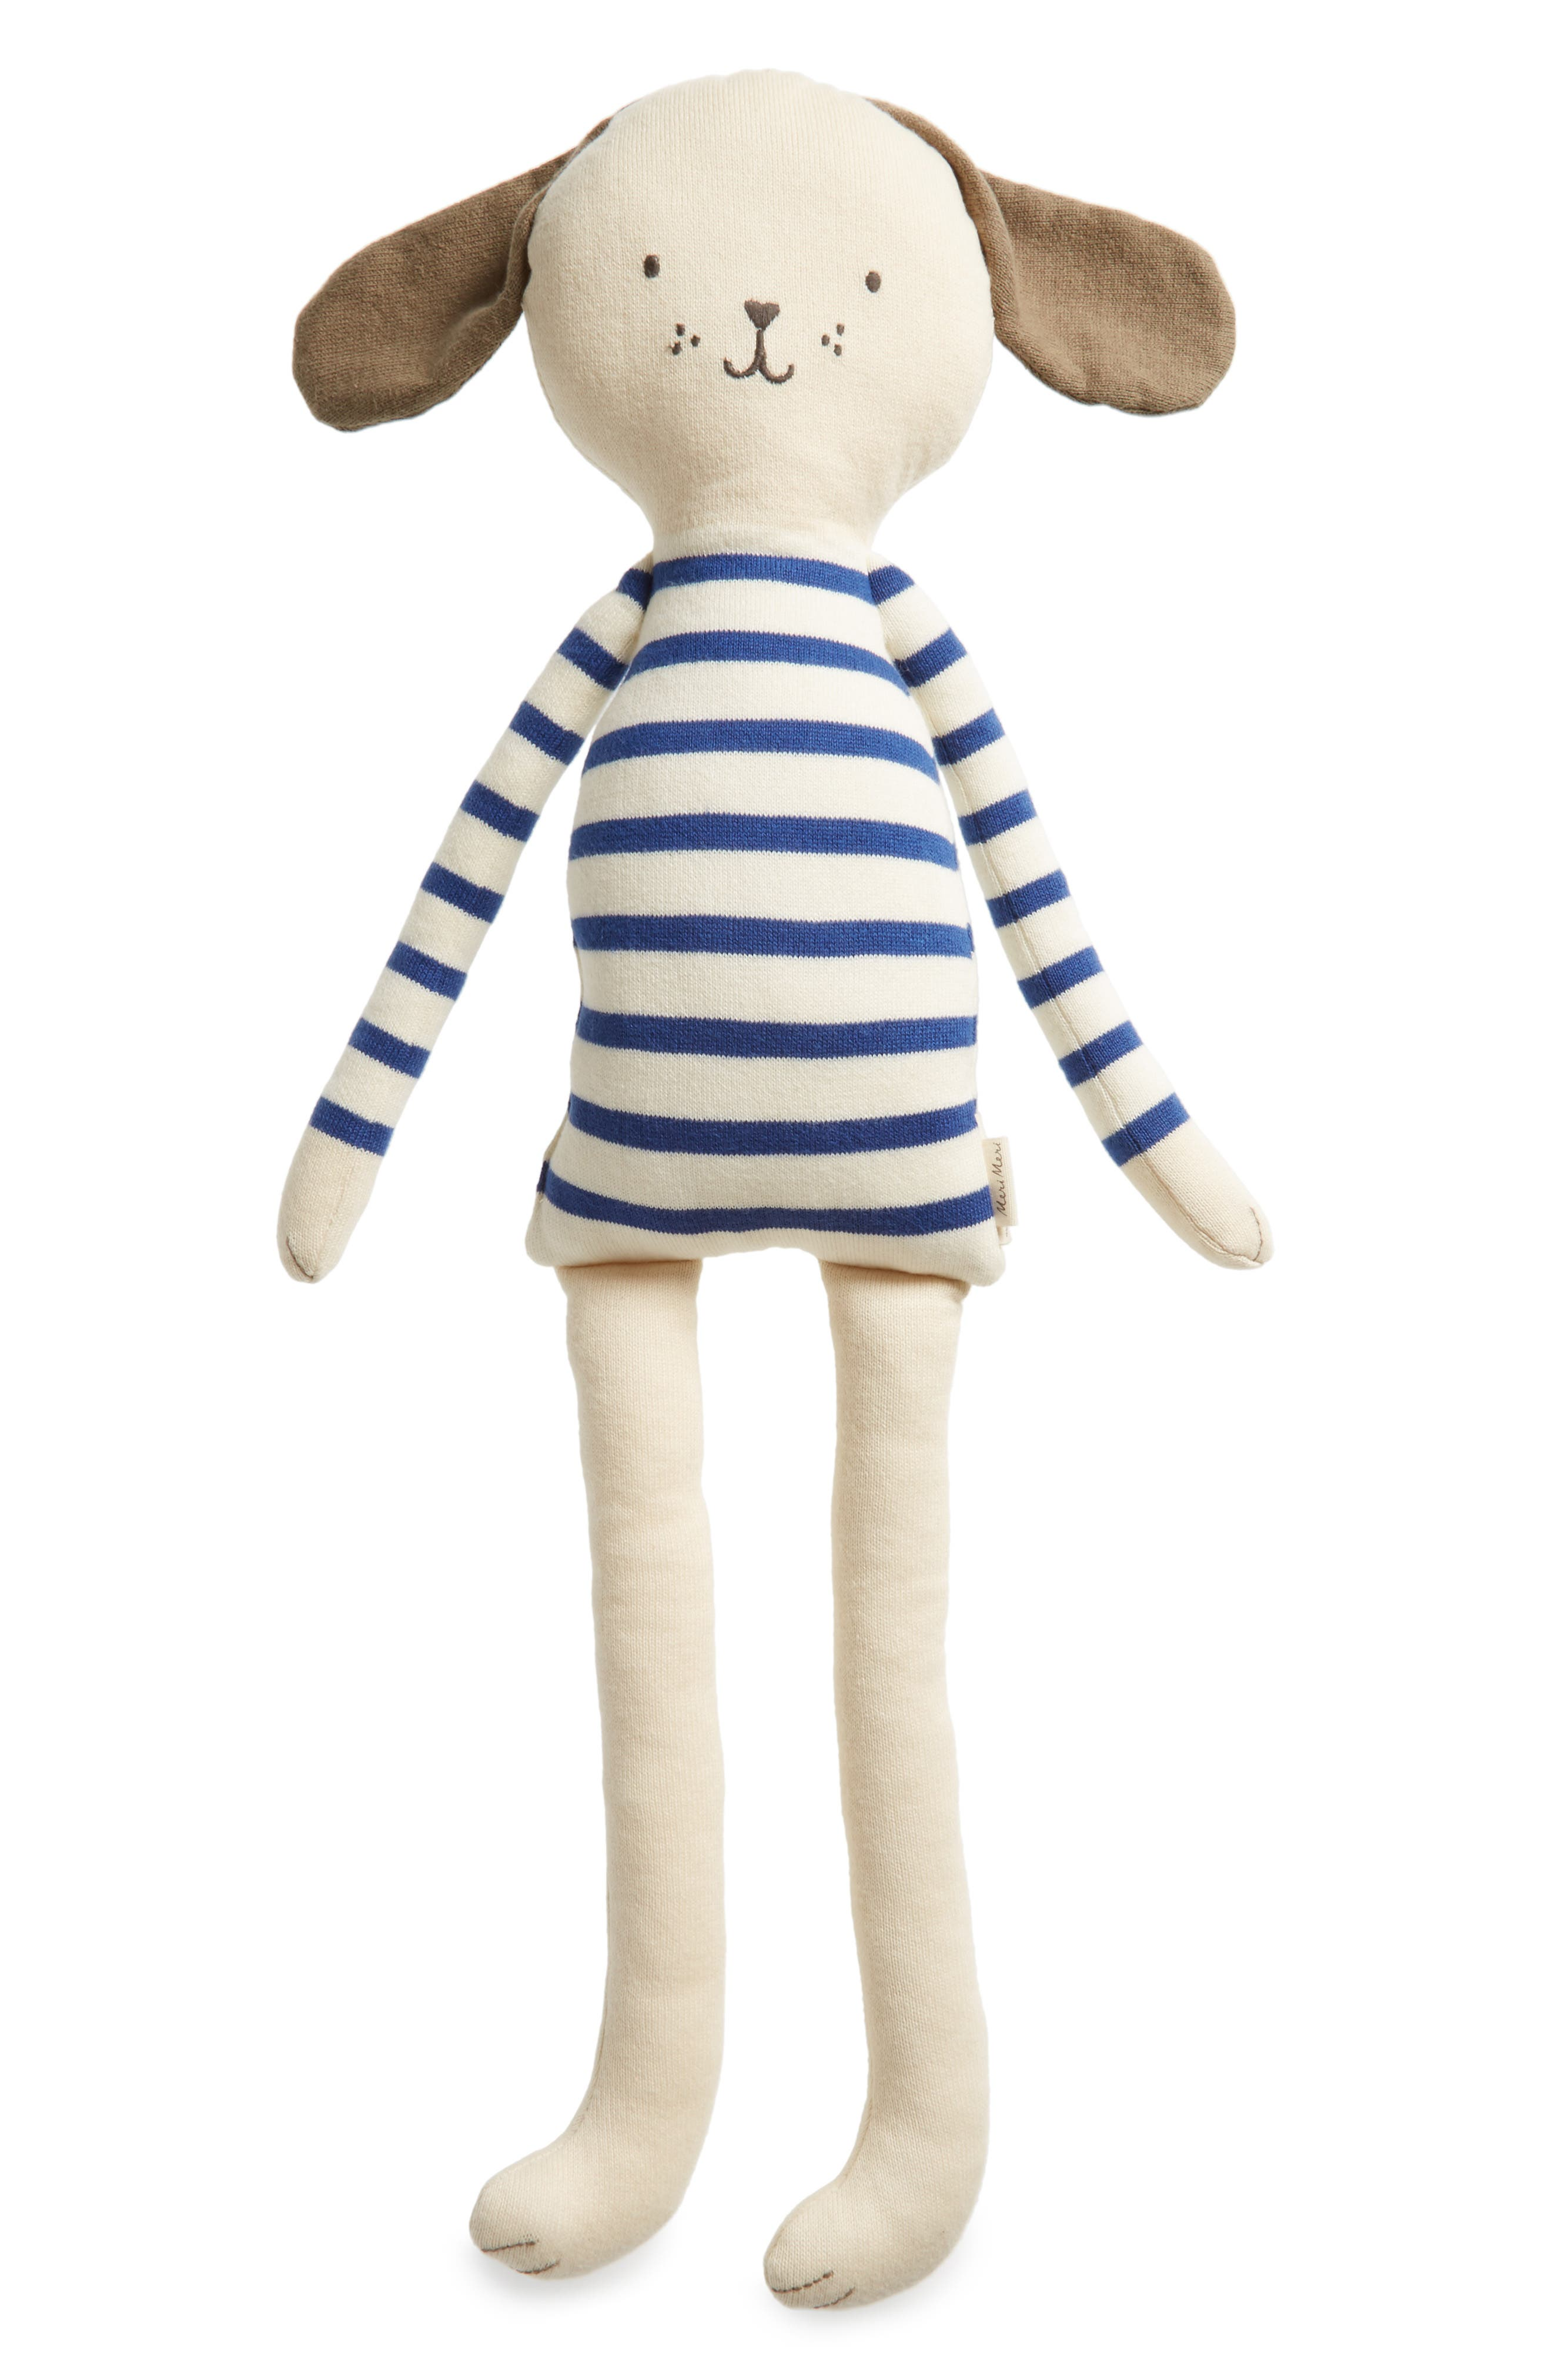 Knit Organic Cotton Dog Cushion/Toy,                             Main thumbnail 1, color,                             400